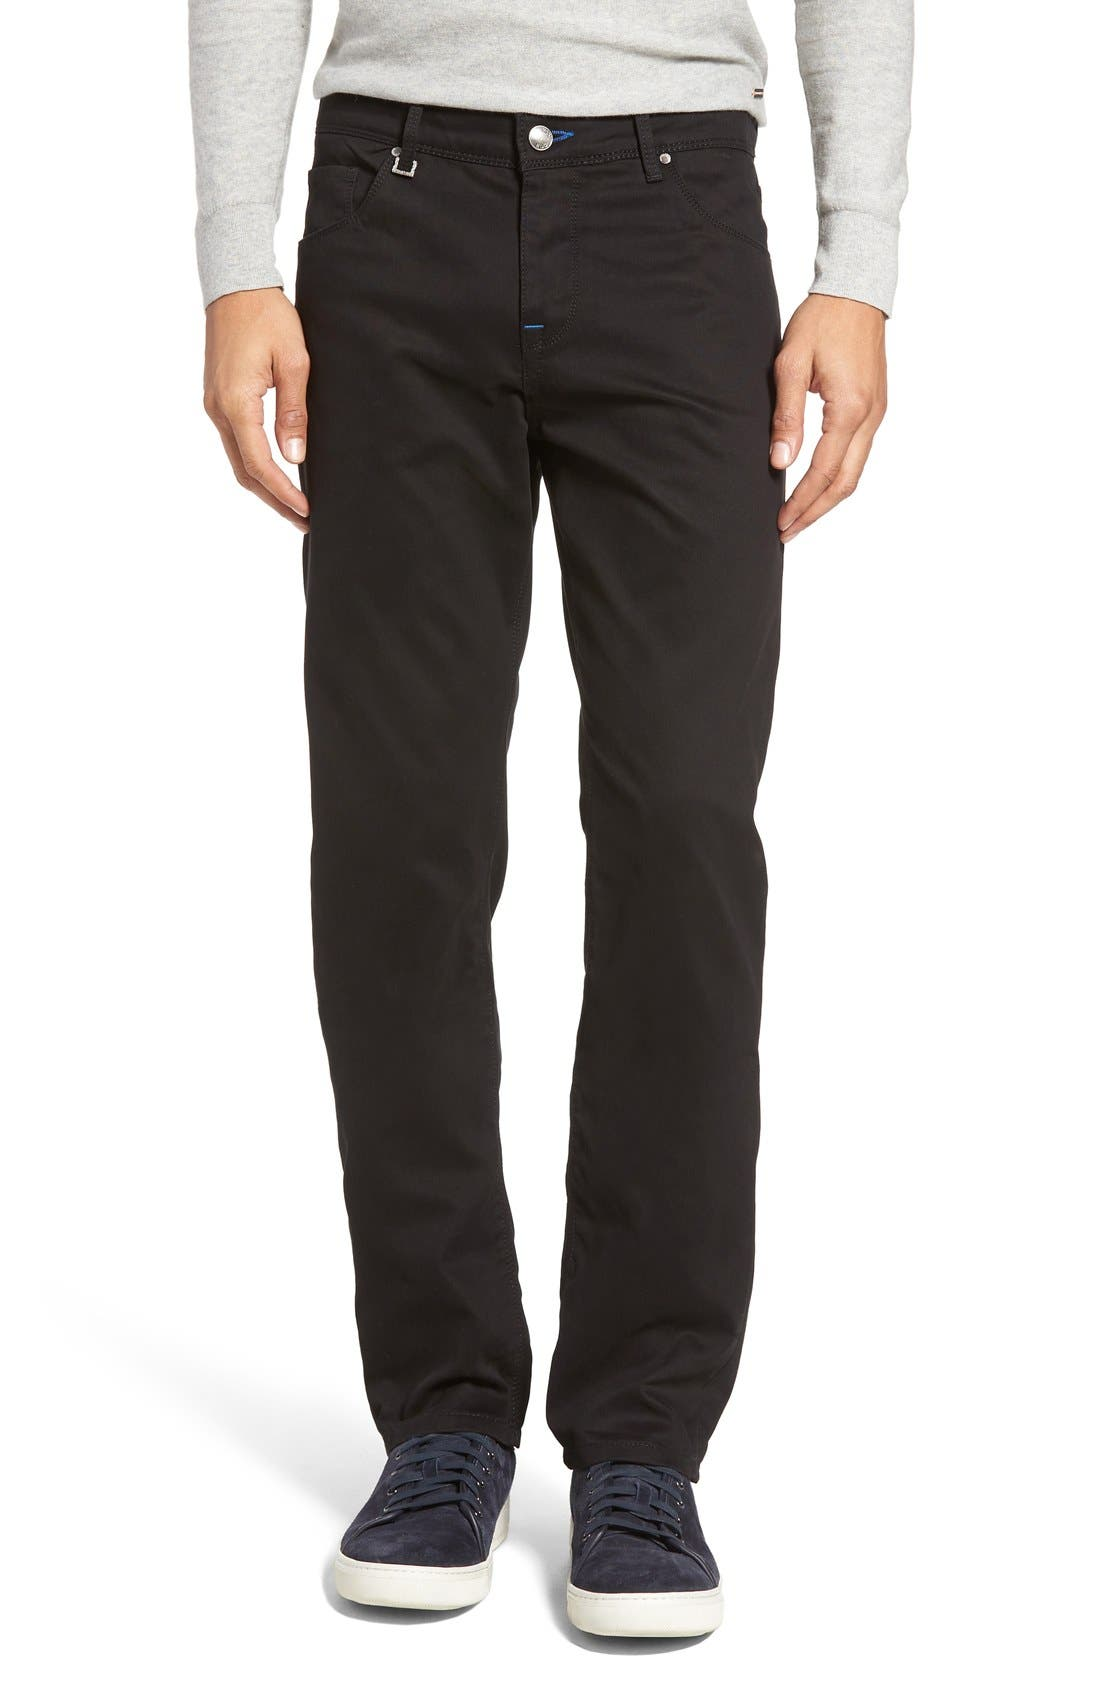 BUGATCHI Slim Fit Five-Pocket Pants